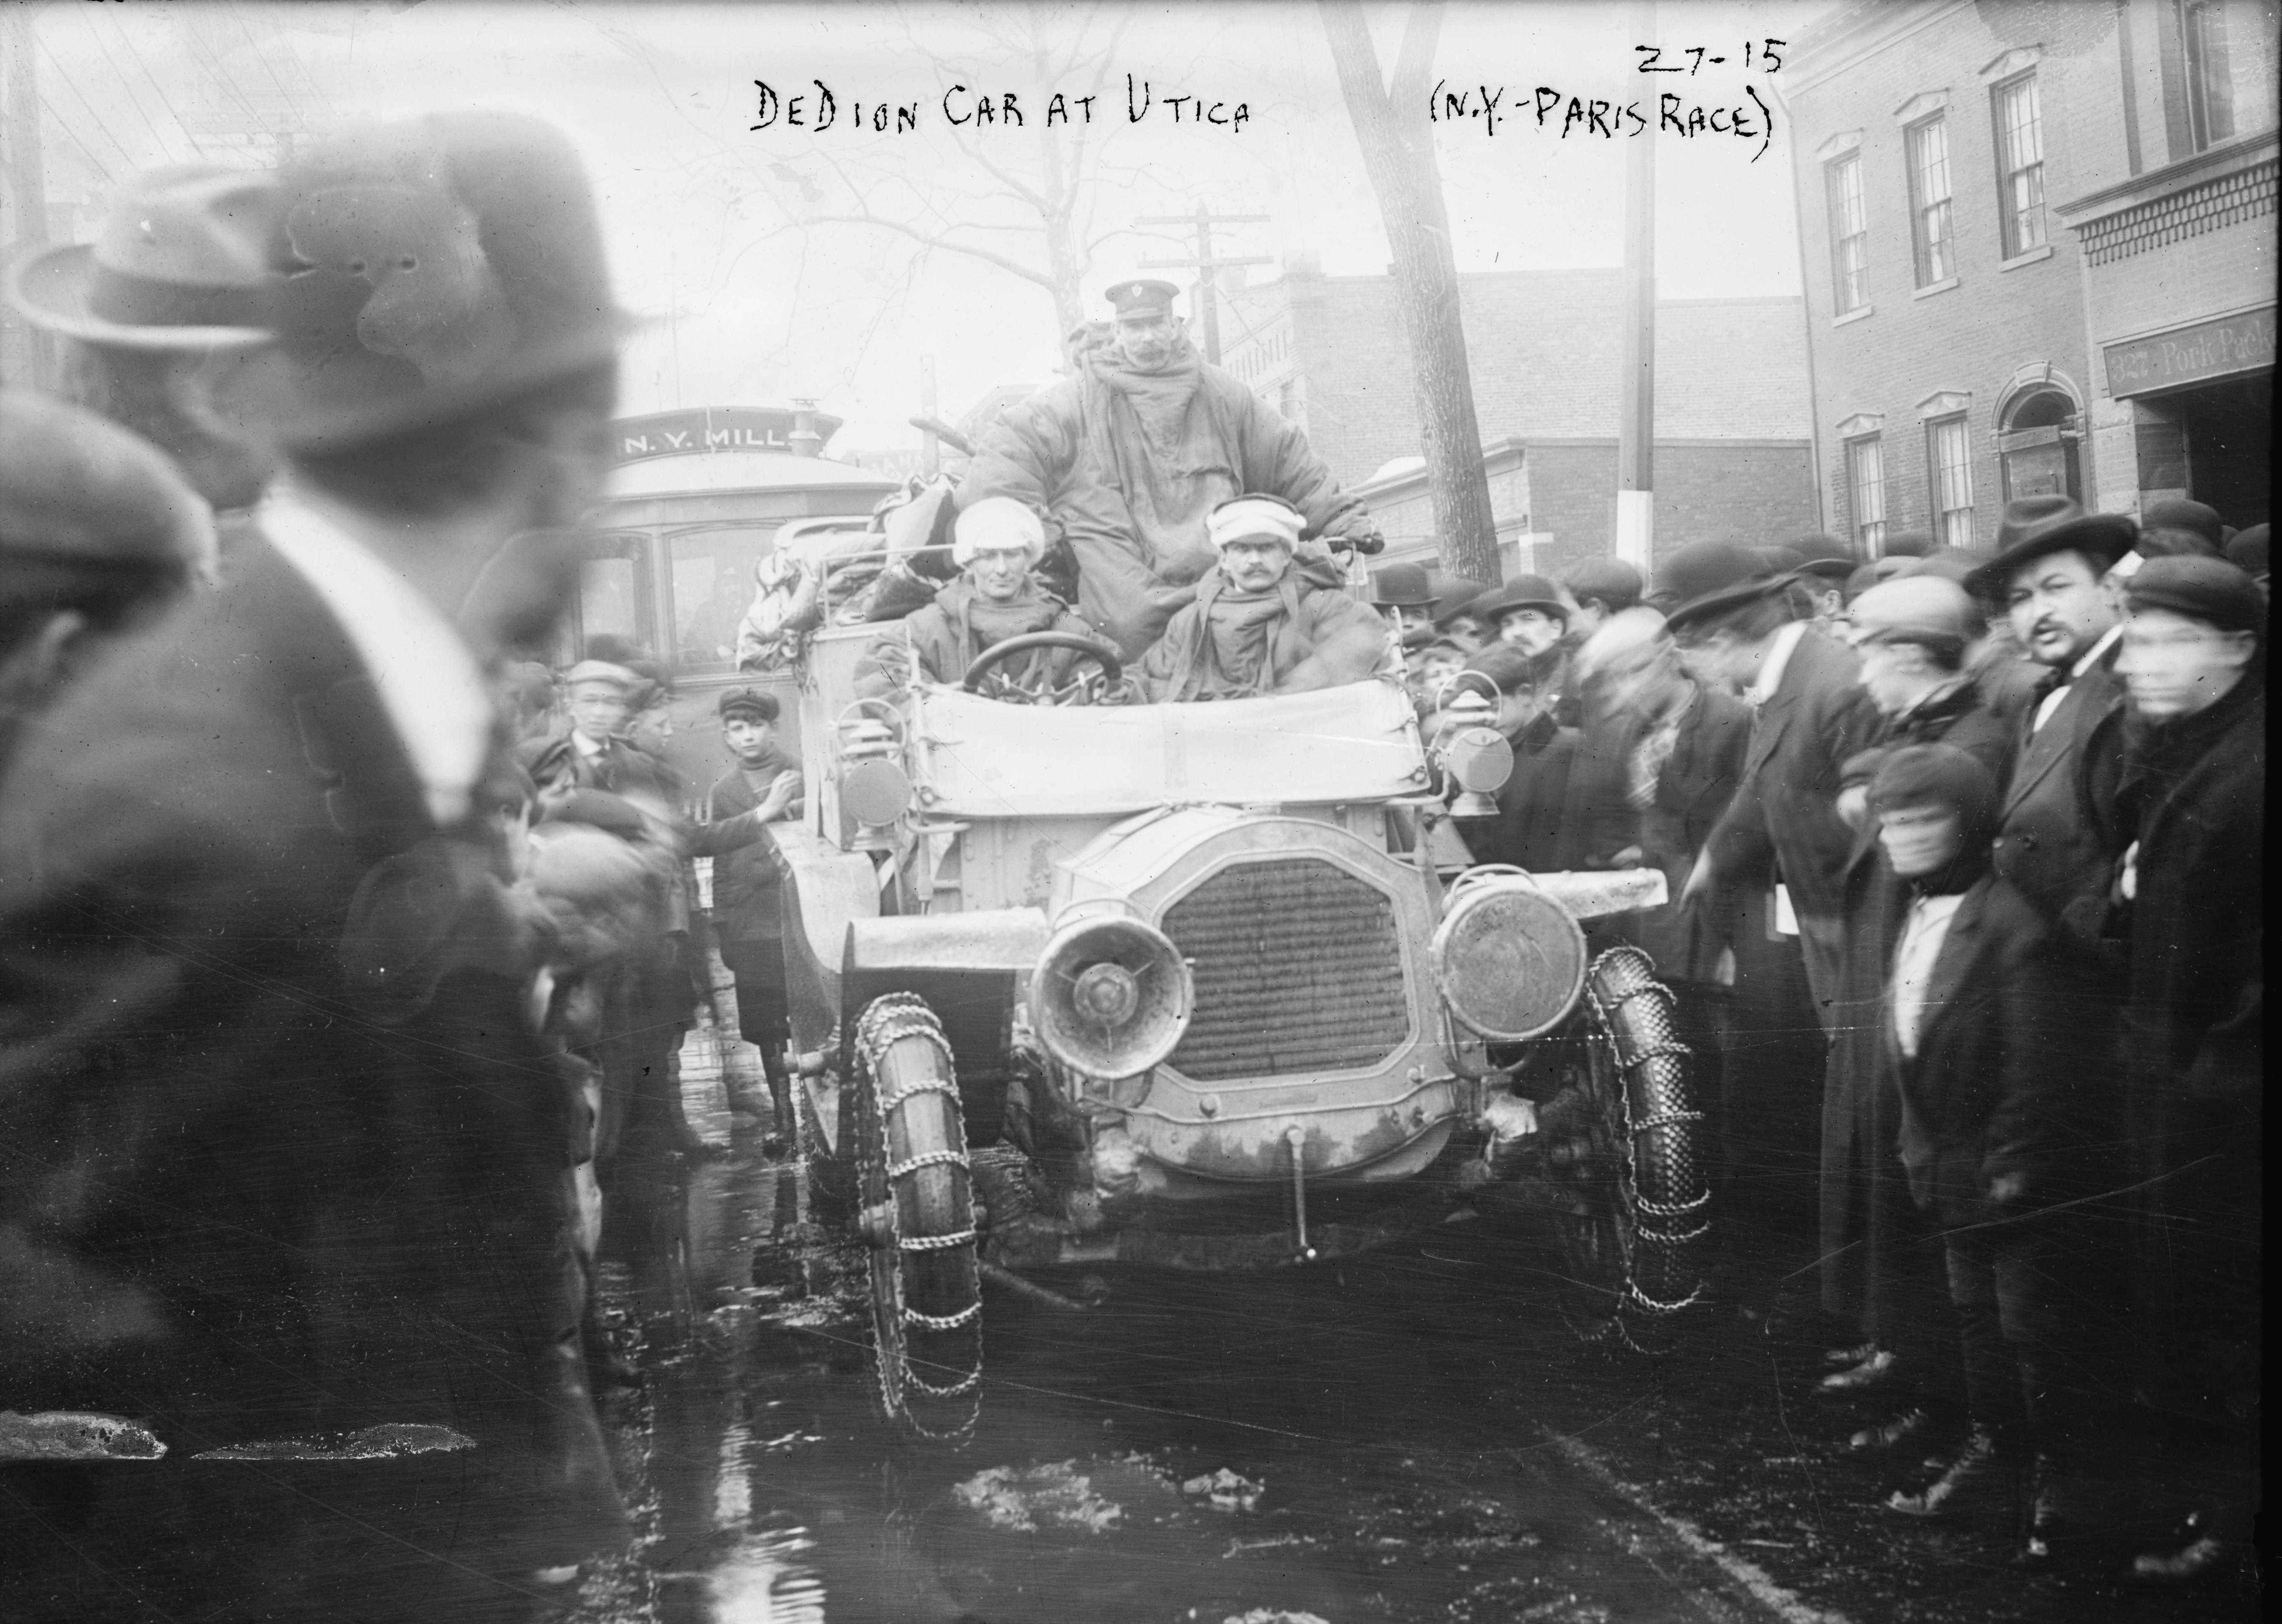 http://upload.wikimedia.org/wikipedia/commons/e/e6/1908_New_York_to_Paris_Race%2C_Dedion.jpg